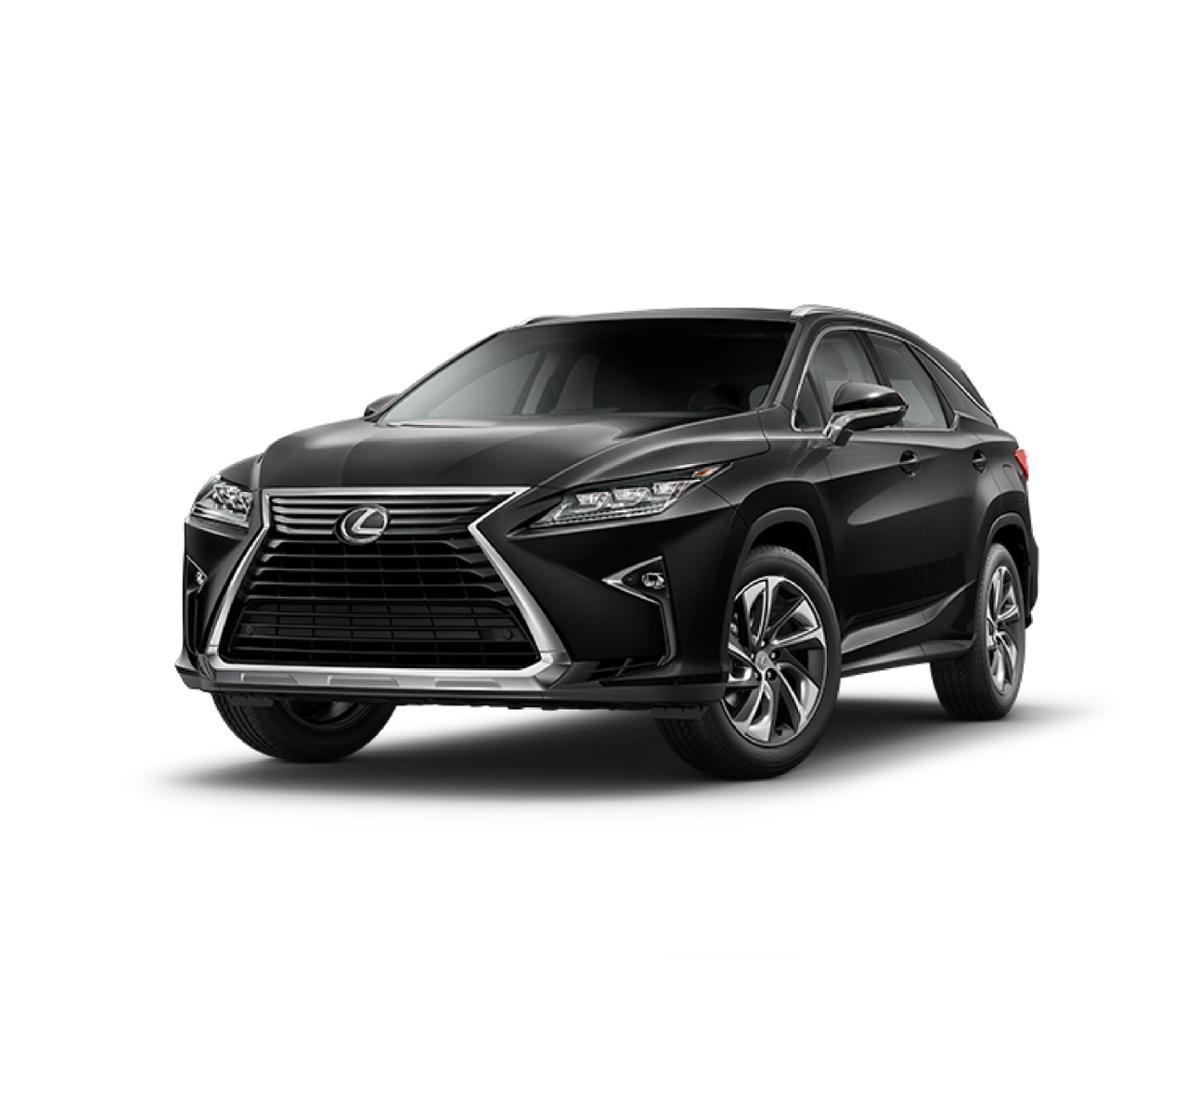 East Haven Lexus RX 350L 2019 Caviar: New Suv for Sale - L90305